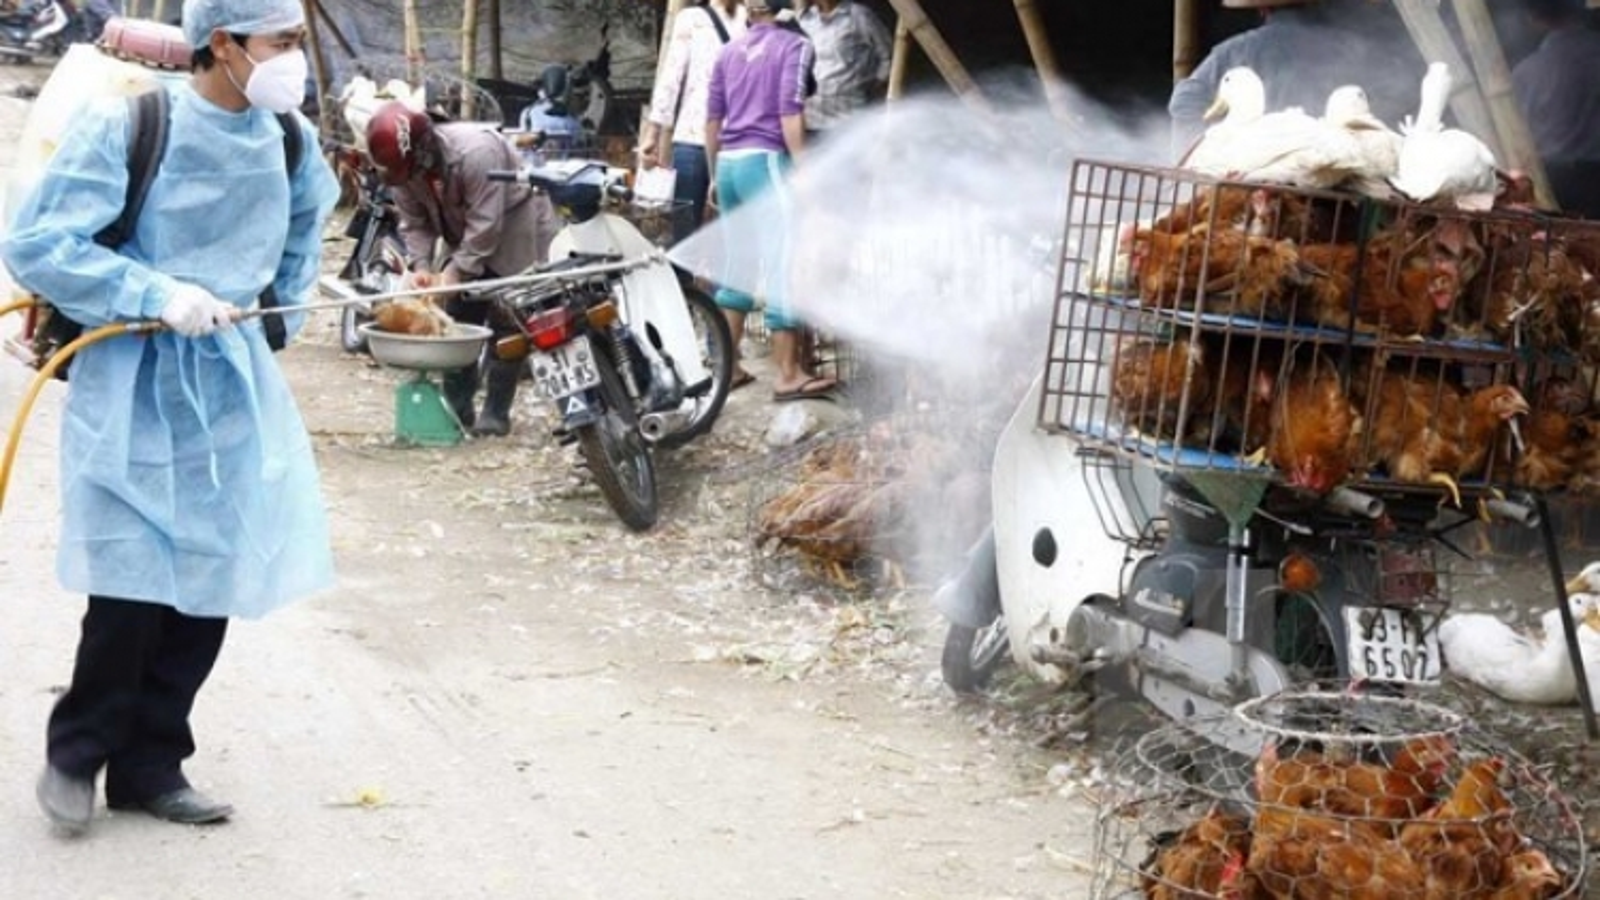 Saudi Arabia suspends live poultry import from Vietnam over bird flu